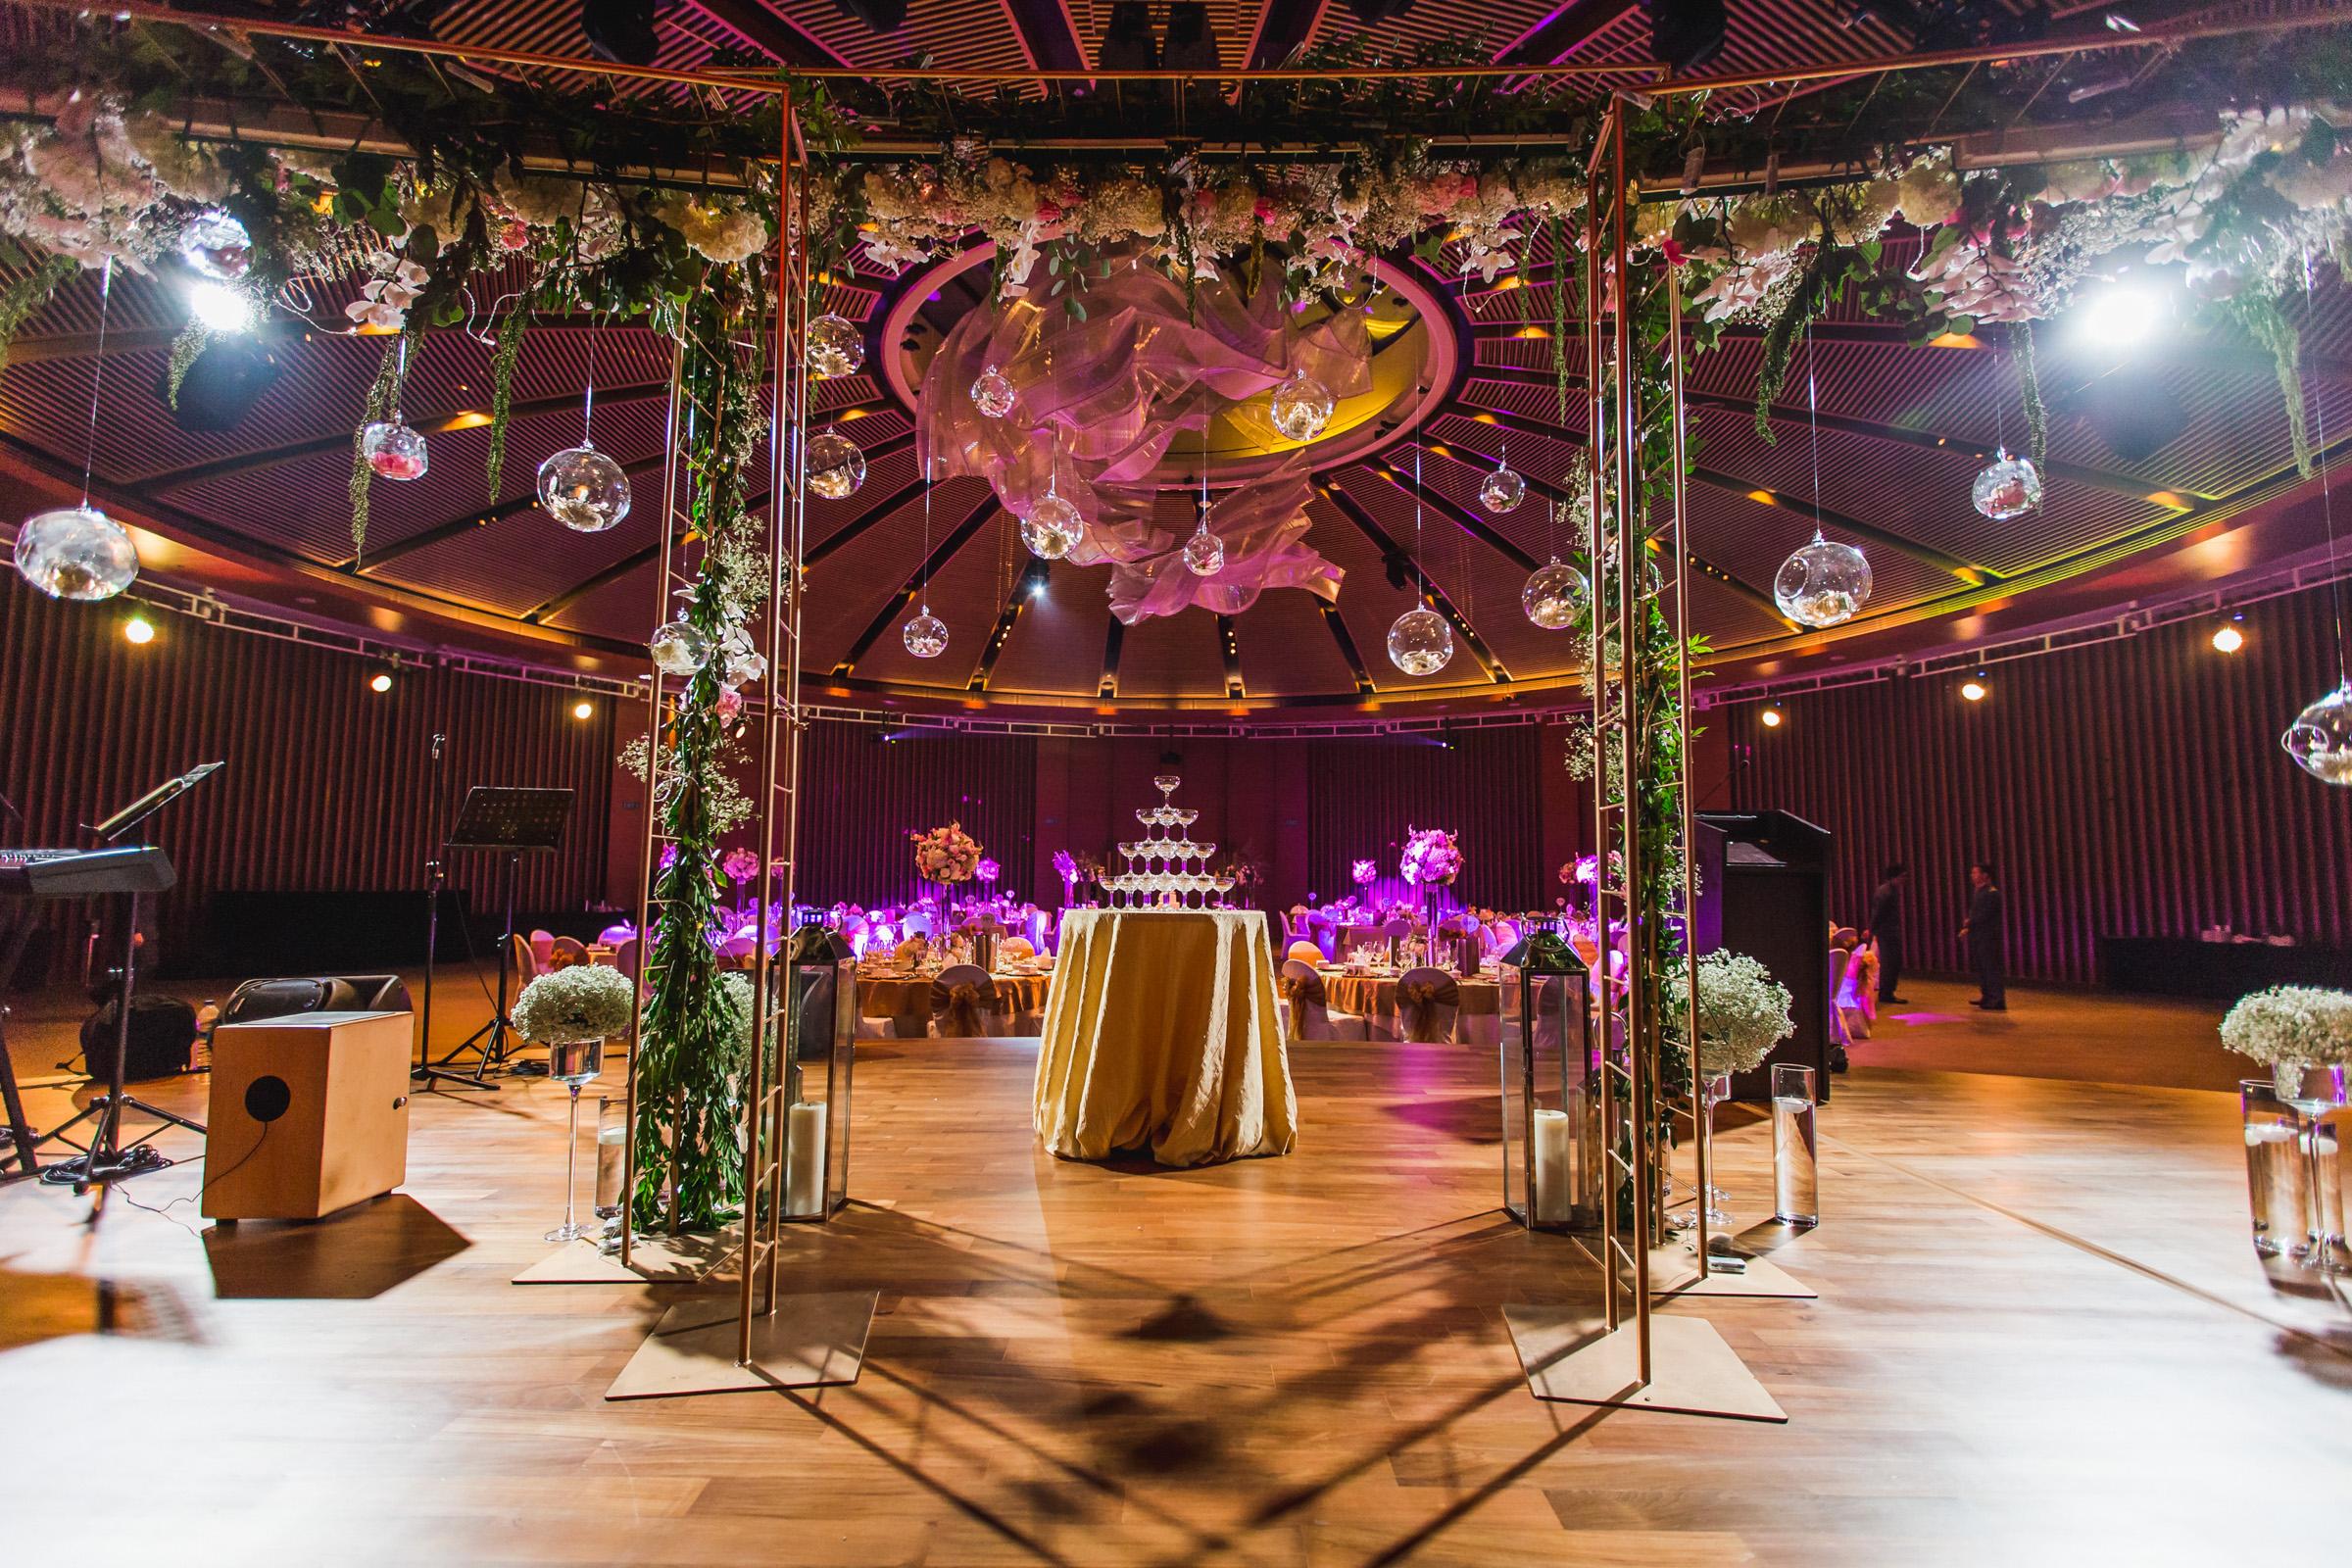 Steven_Jasmine_Wedding_Walldrobe Photography_Wedding shoots_Actual day wedding_Photographer (35)